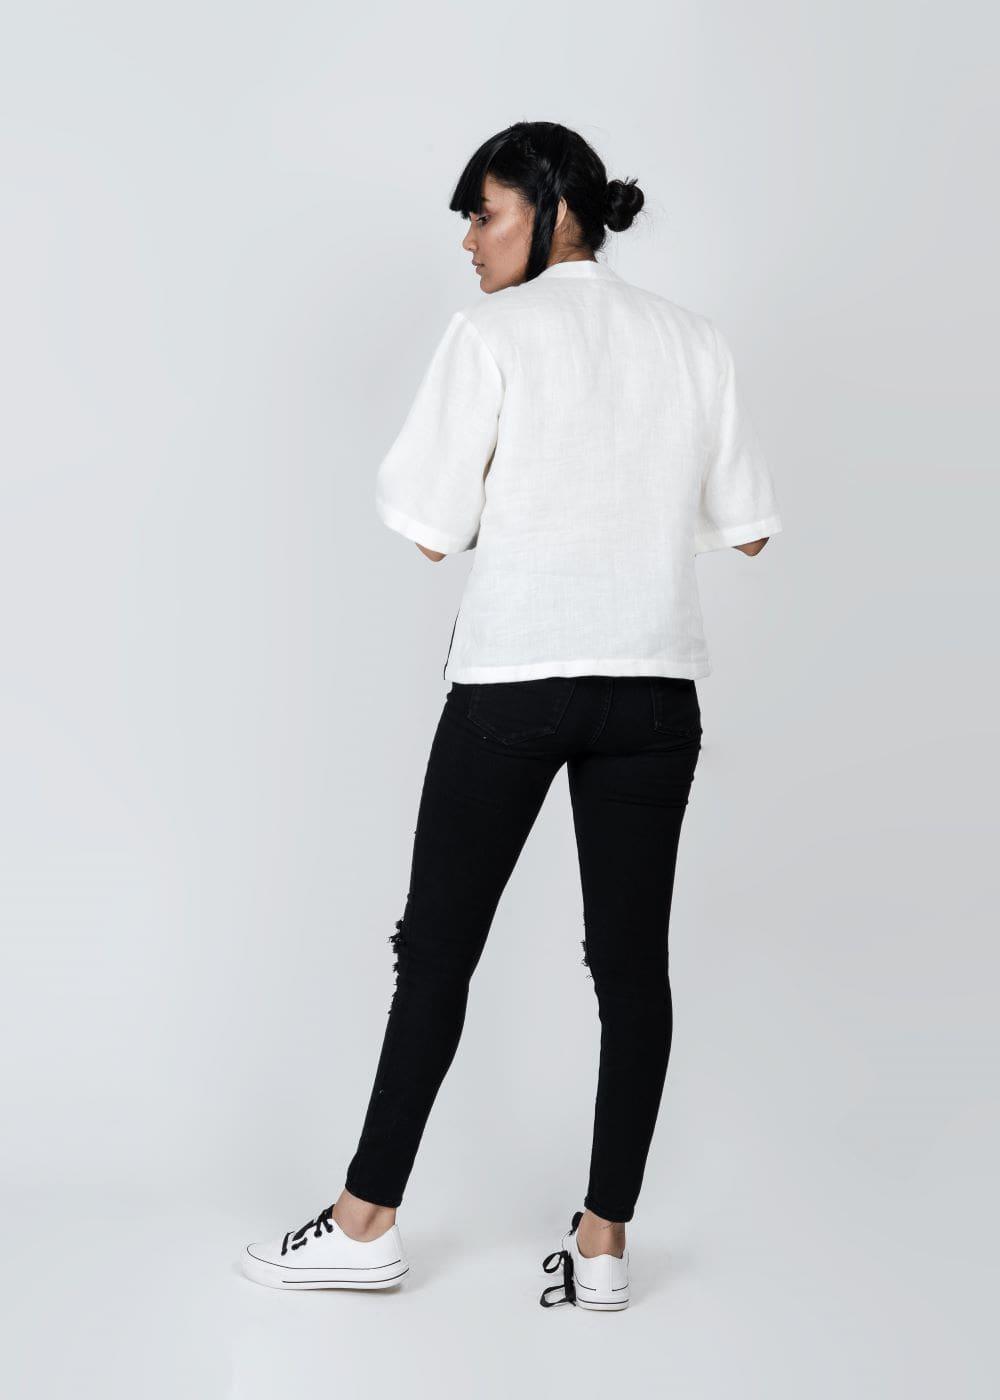 @STOREAT44 | Best Black&White Clothing Brand | 5